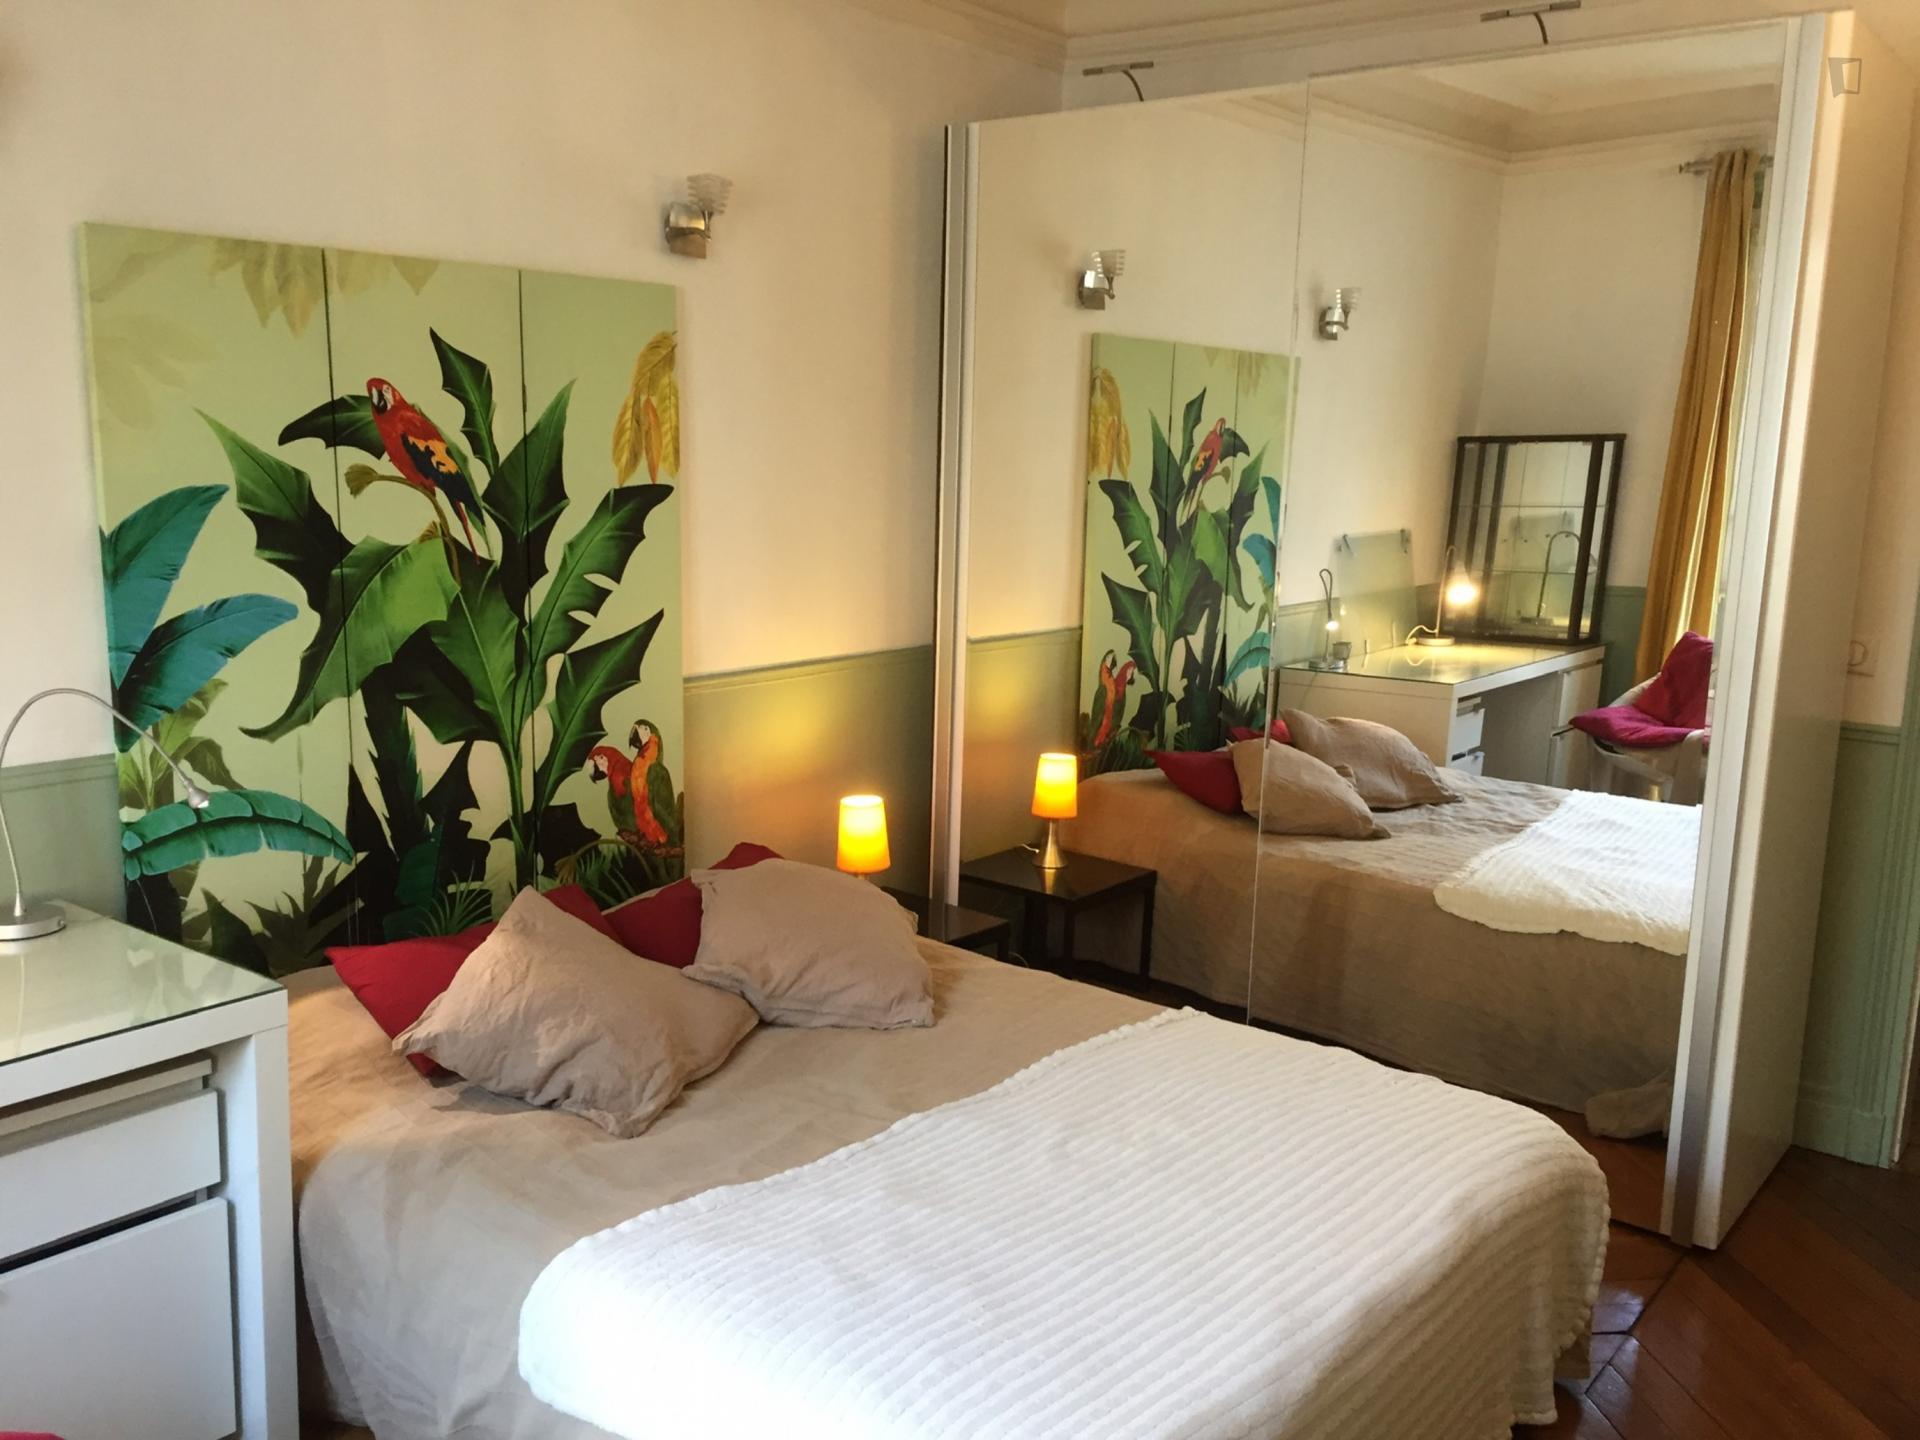 Labie - Bedroom in an apartment in Paris